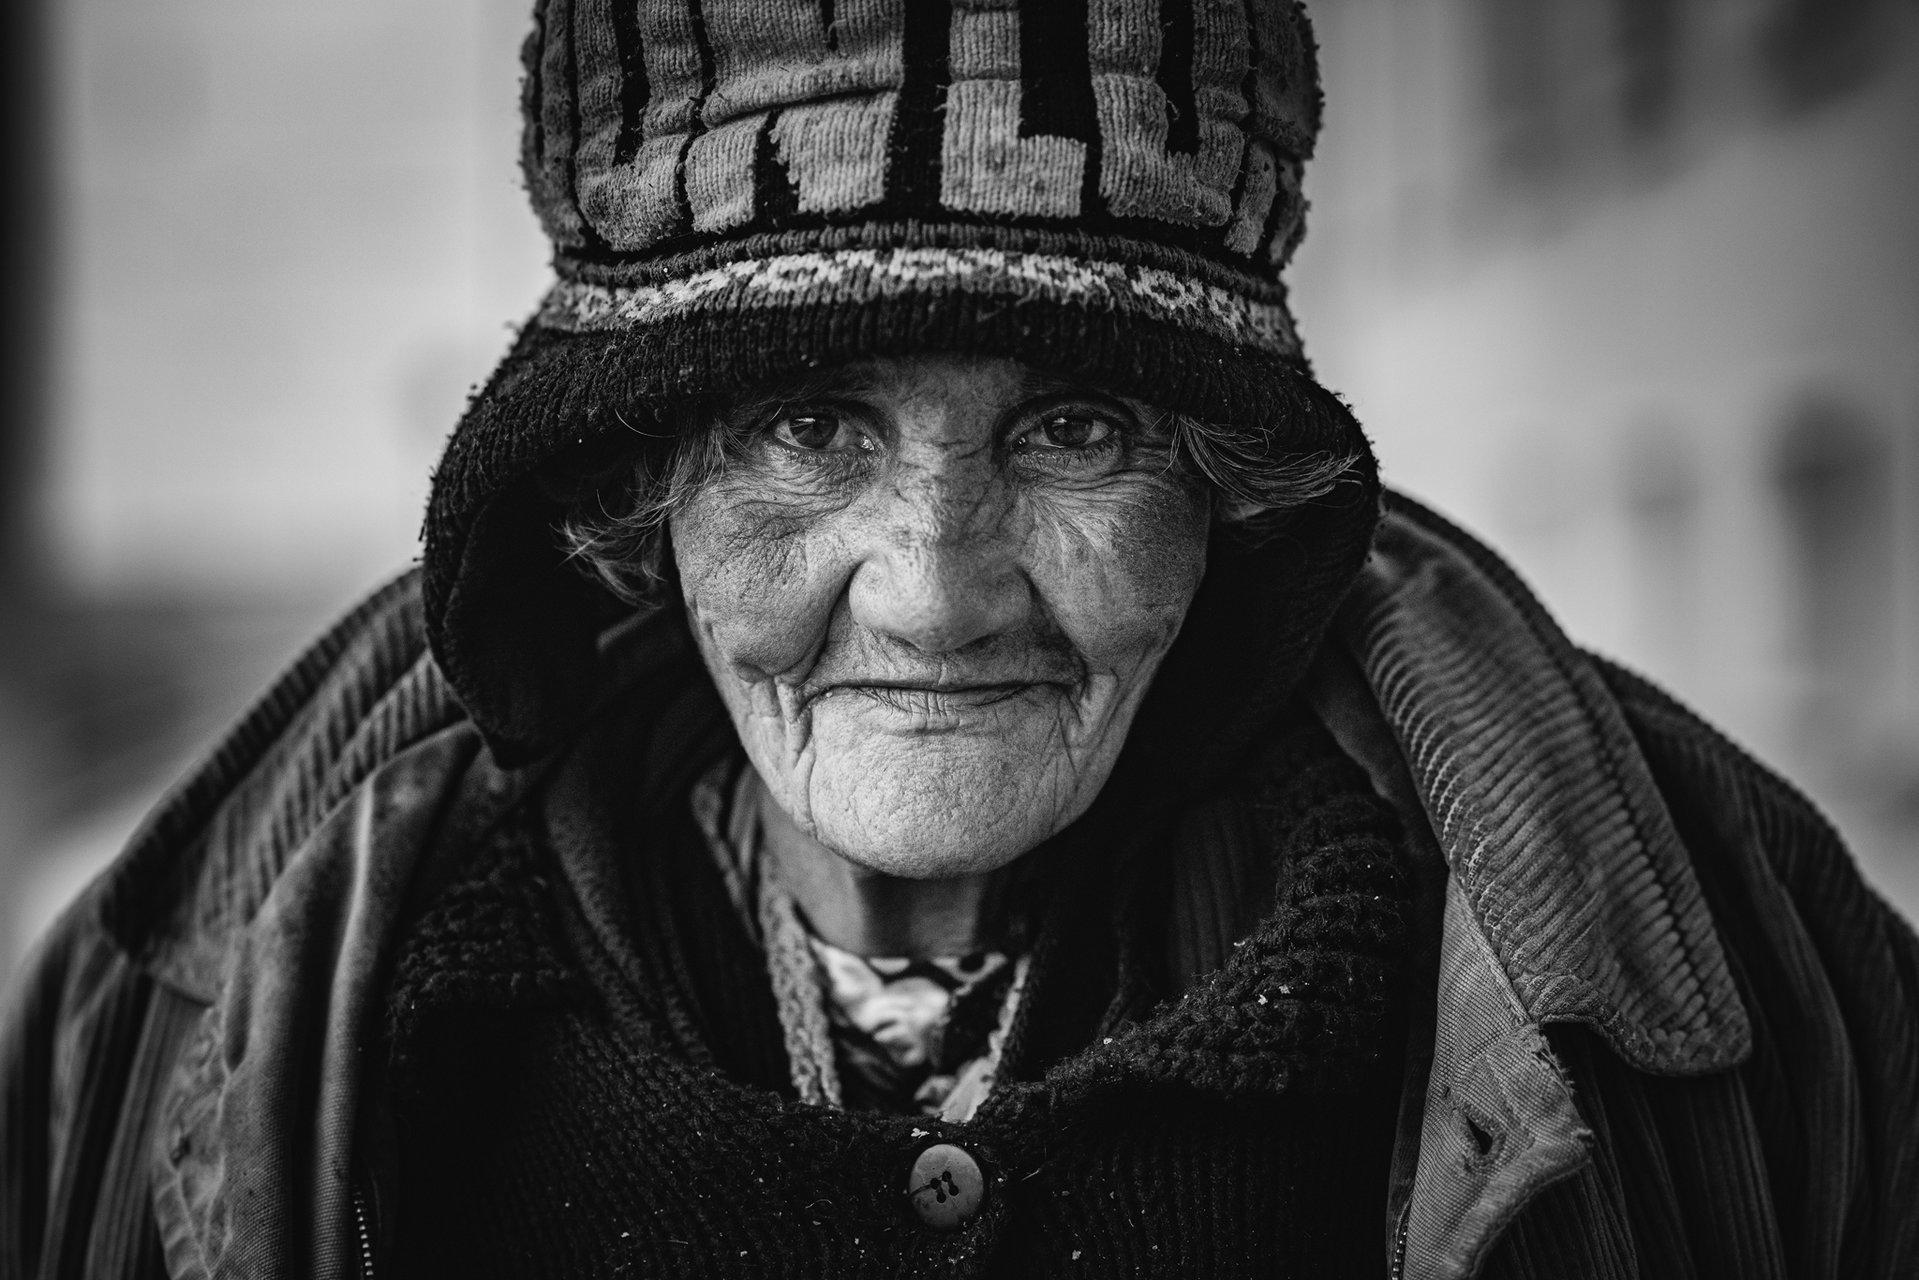 Nobody | Author Stefan Kamenov - stephoko | PHOTO FORUM